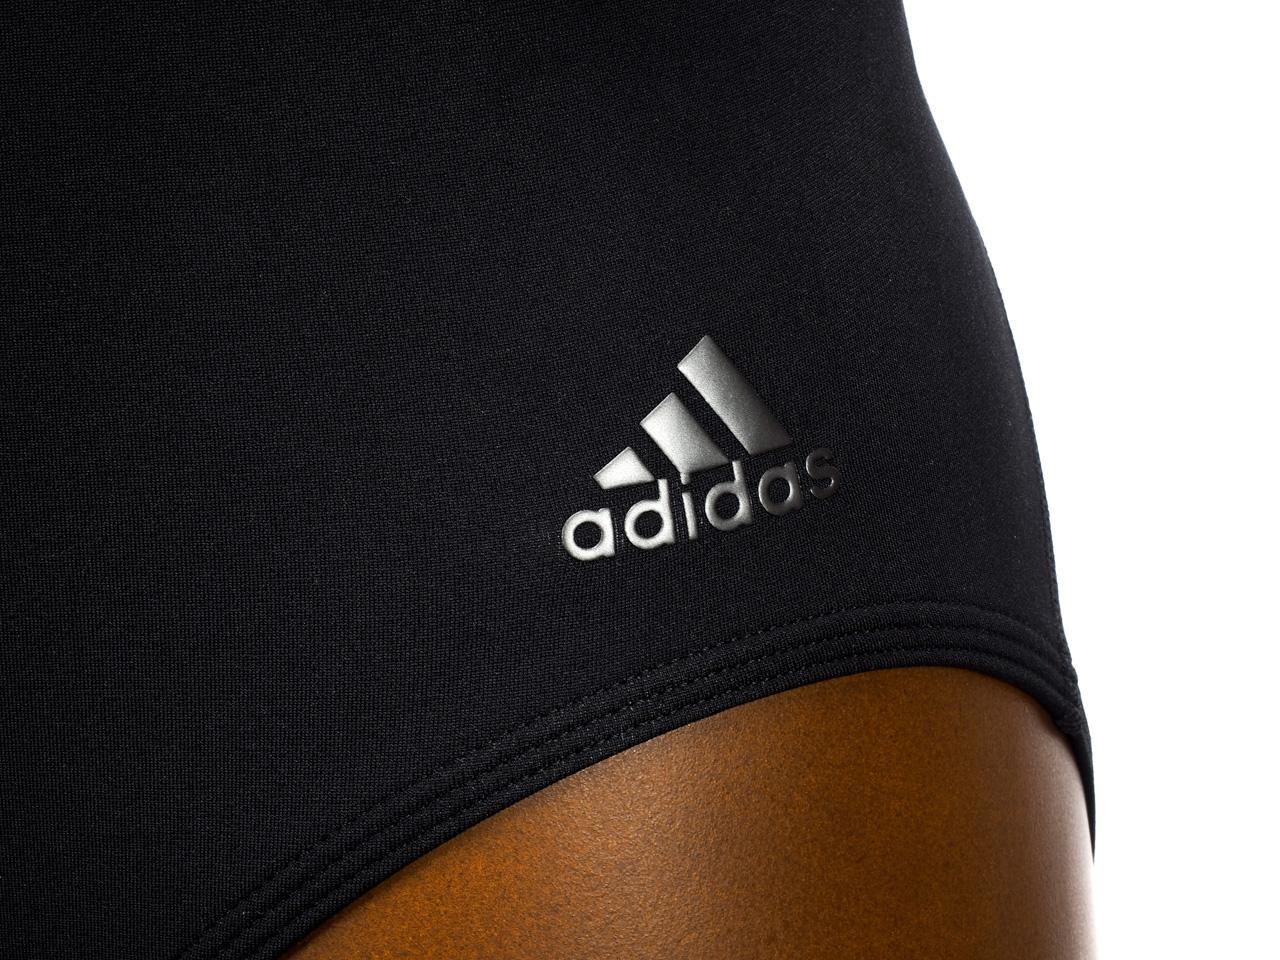 e1d5c897cd Maillot de bain 1 pièce Adidas Perf swim inf black/shop Noir 57960 ...